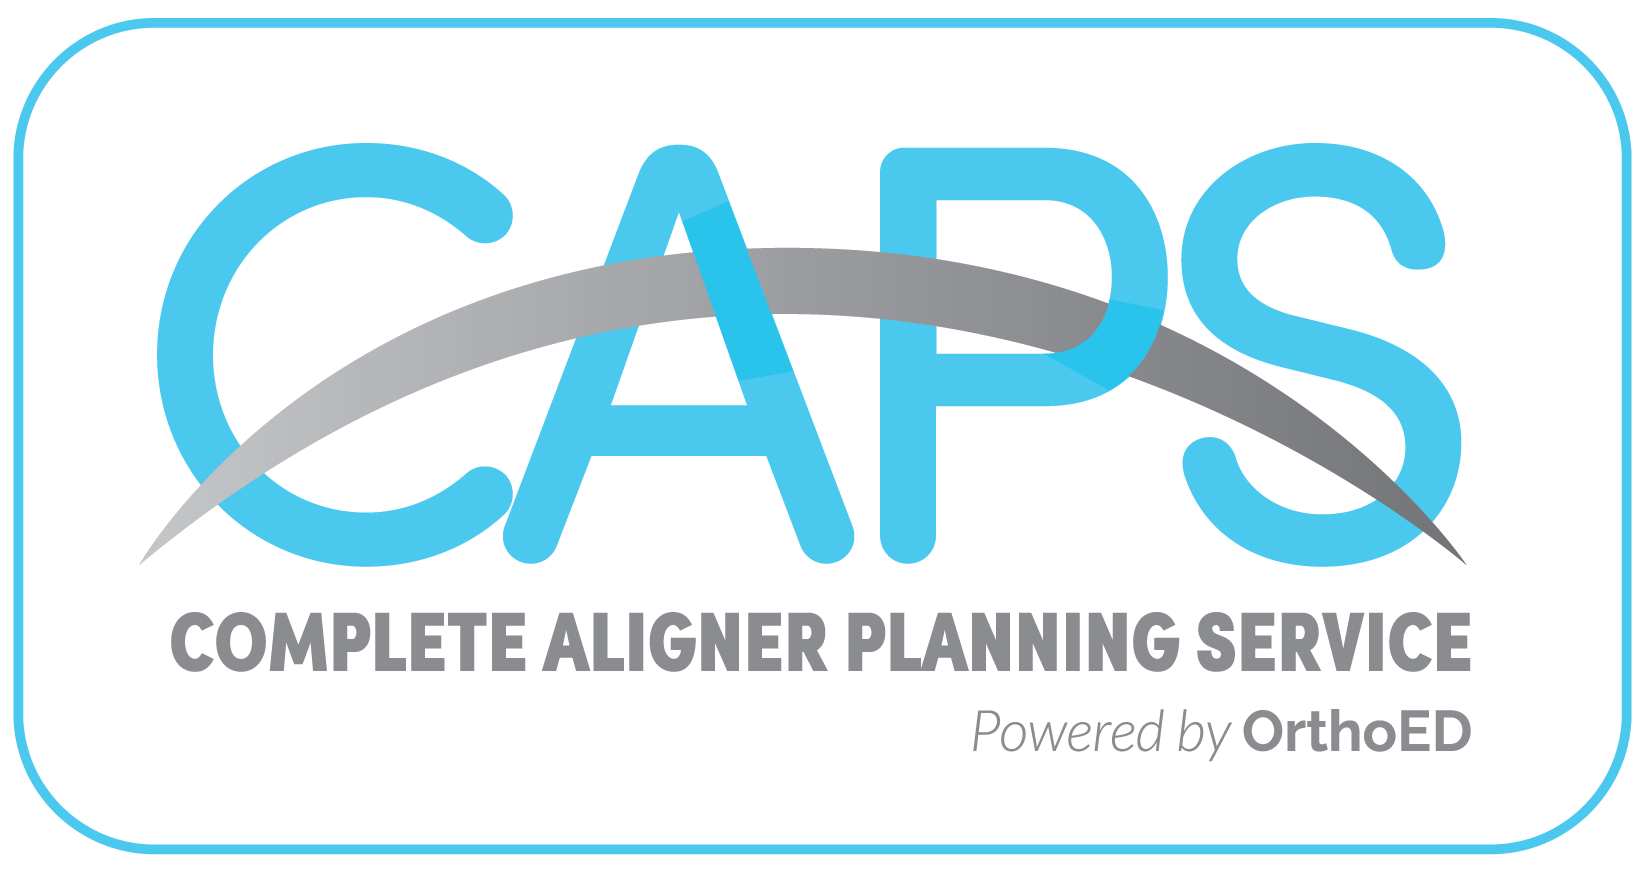 Complete Aligner Planning Services